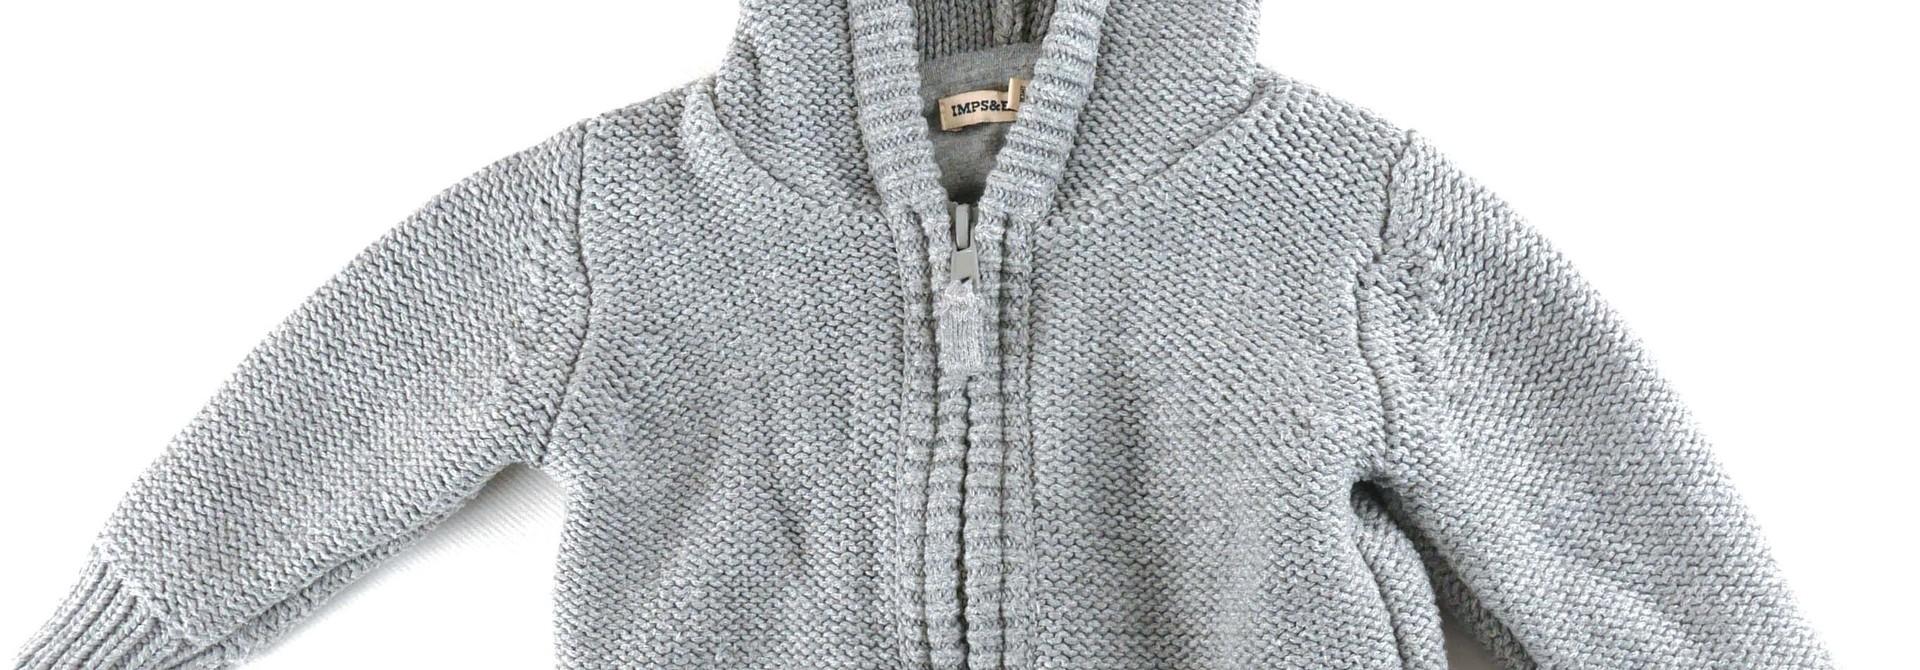 Sweater Imps & Elfs